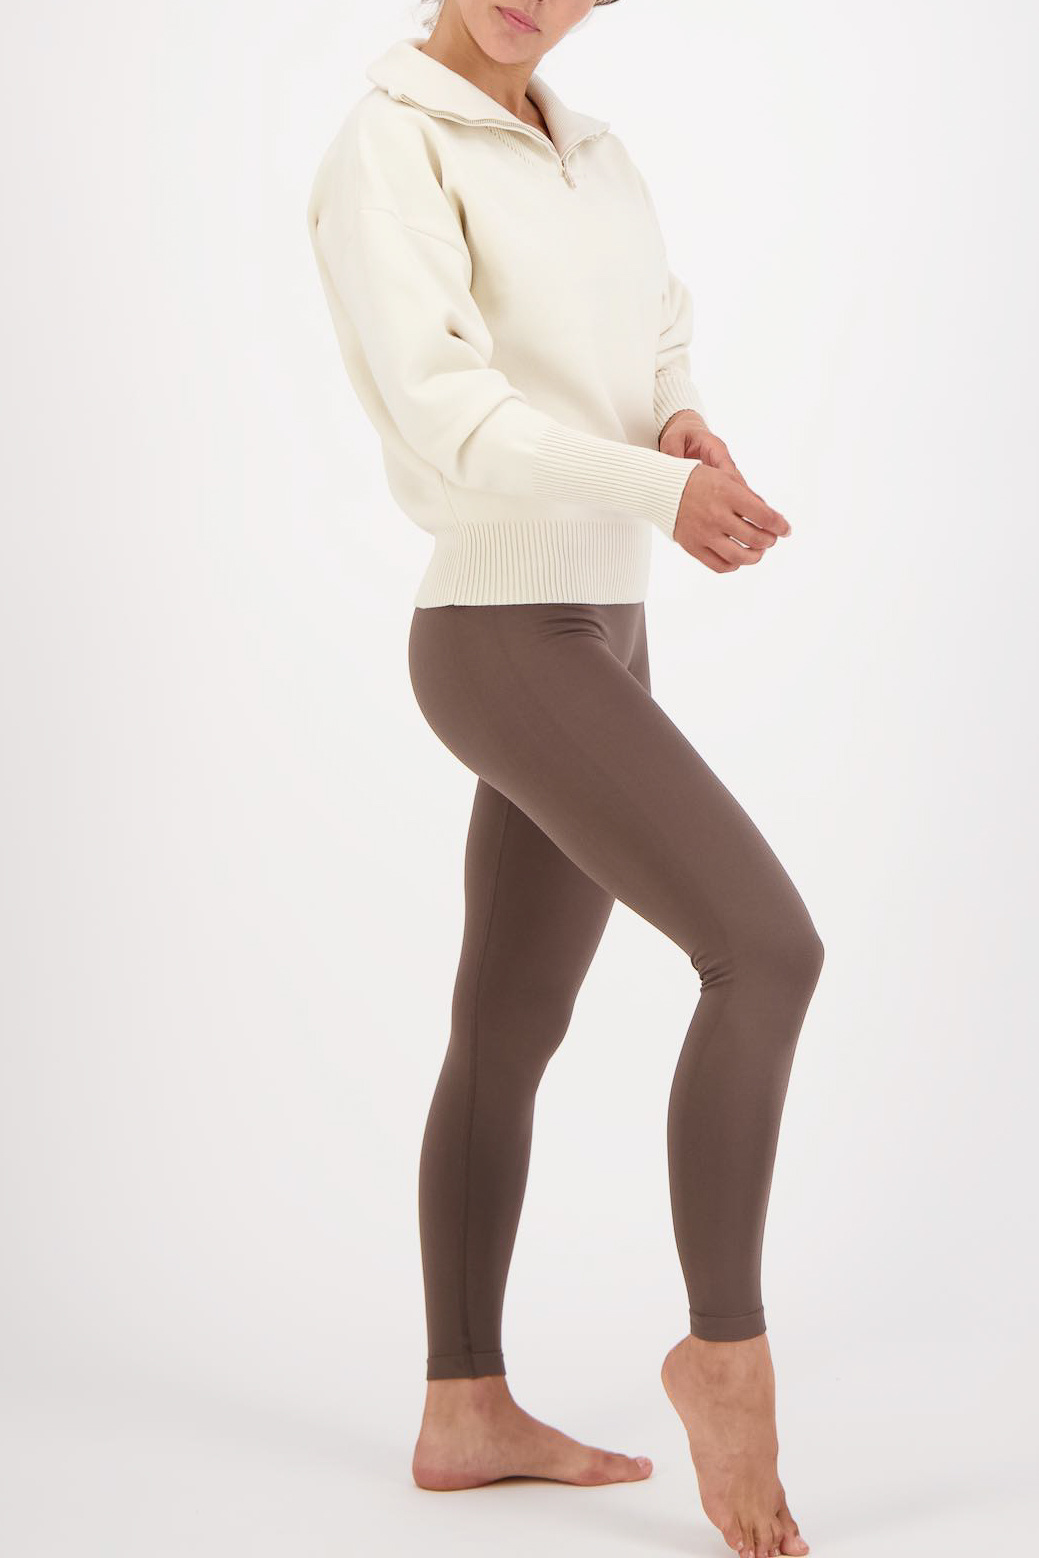 Olly Half-Zip Knit Sweater - Cream White-4